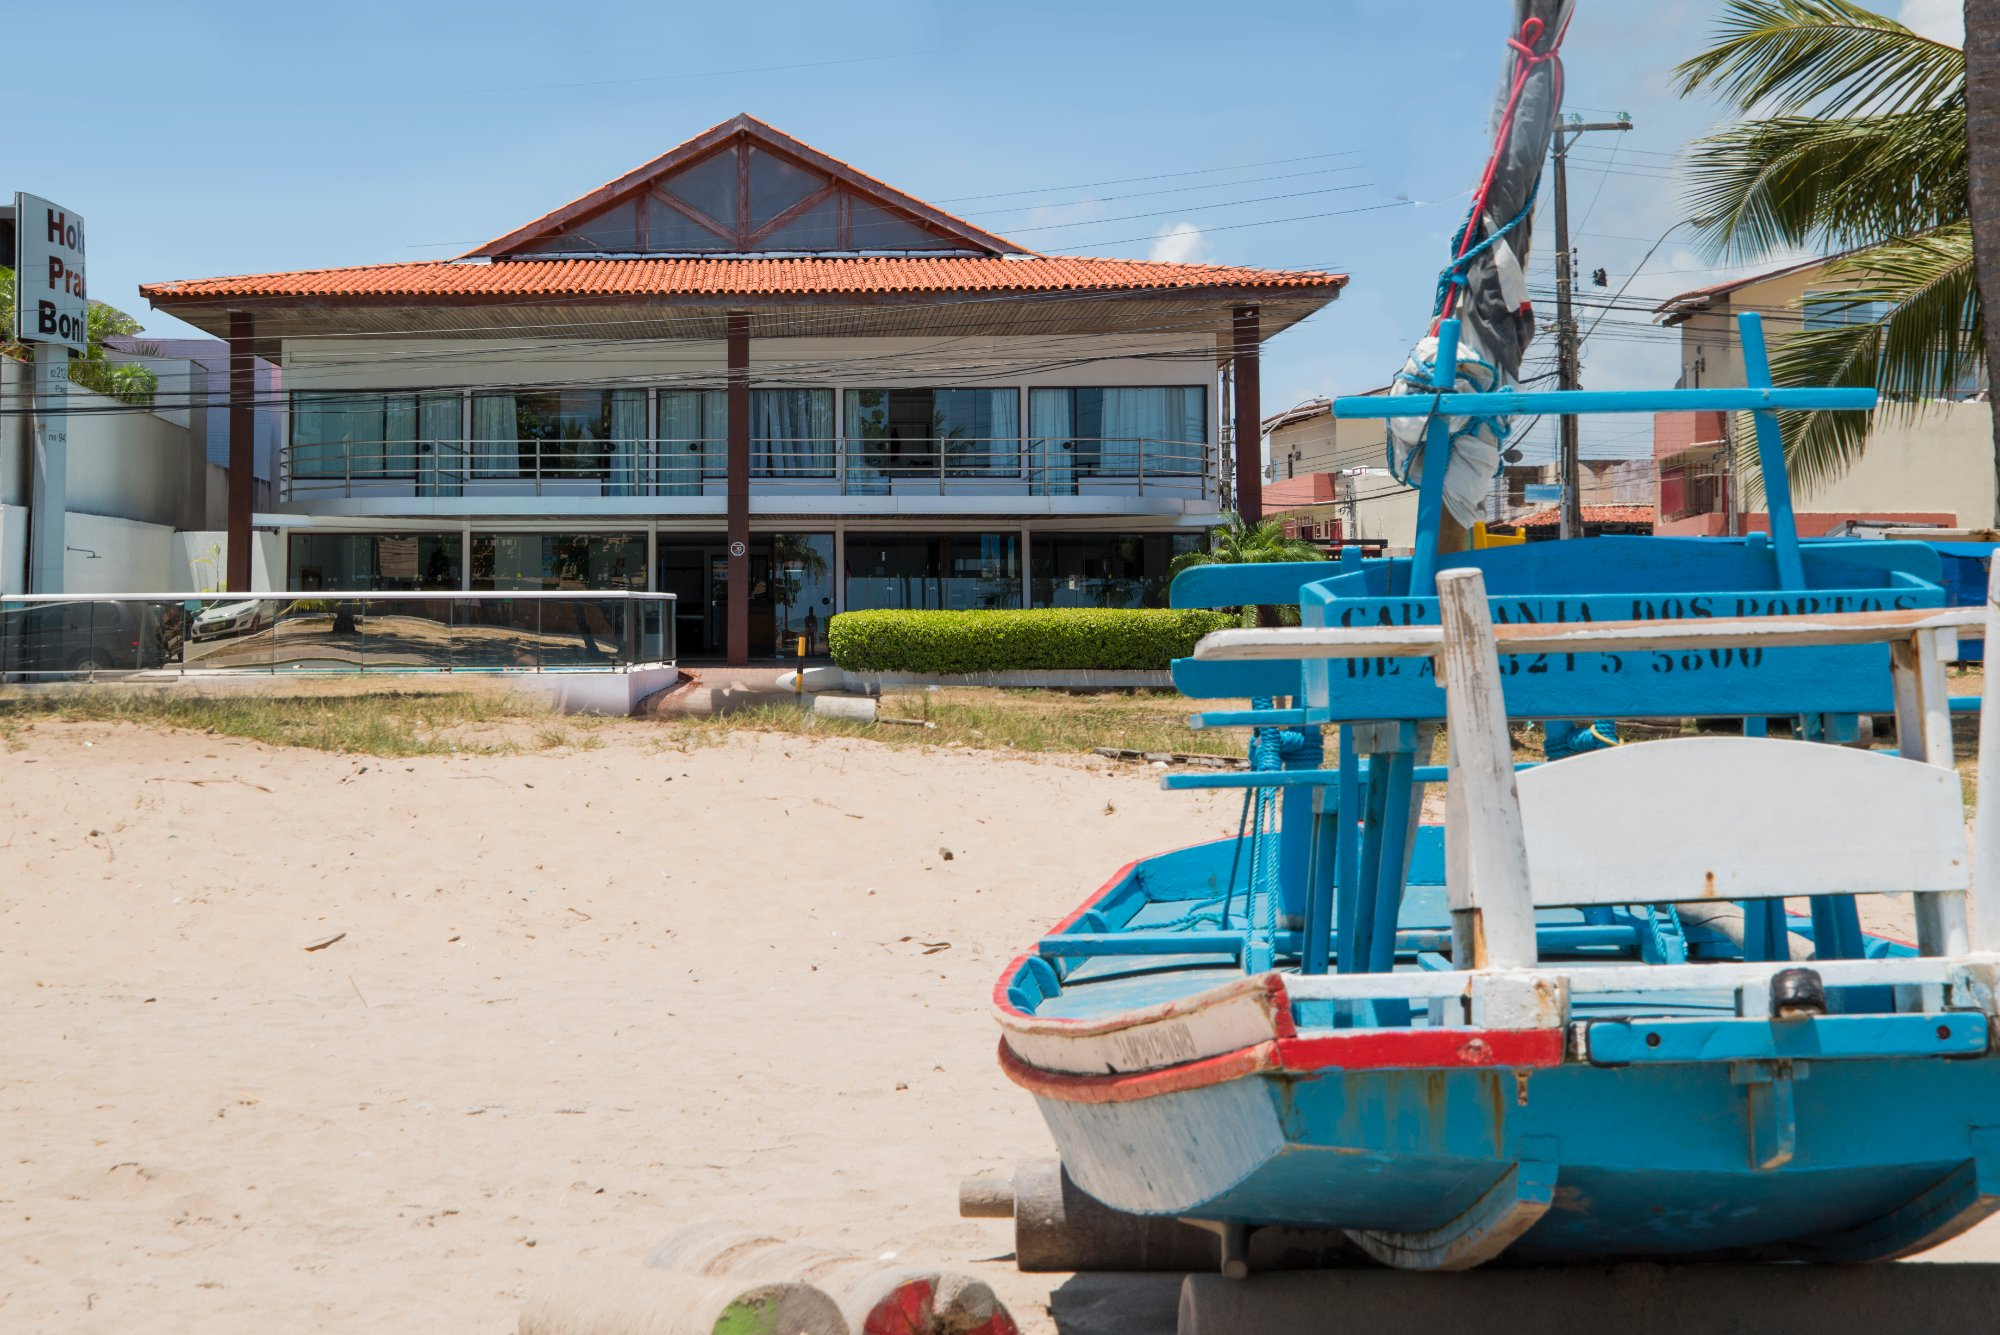 Hotel Praia Bonita